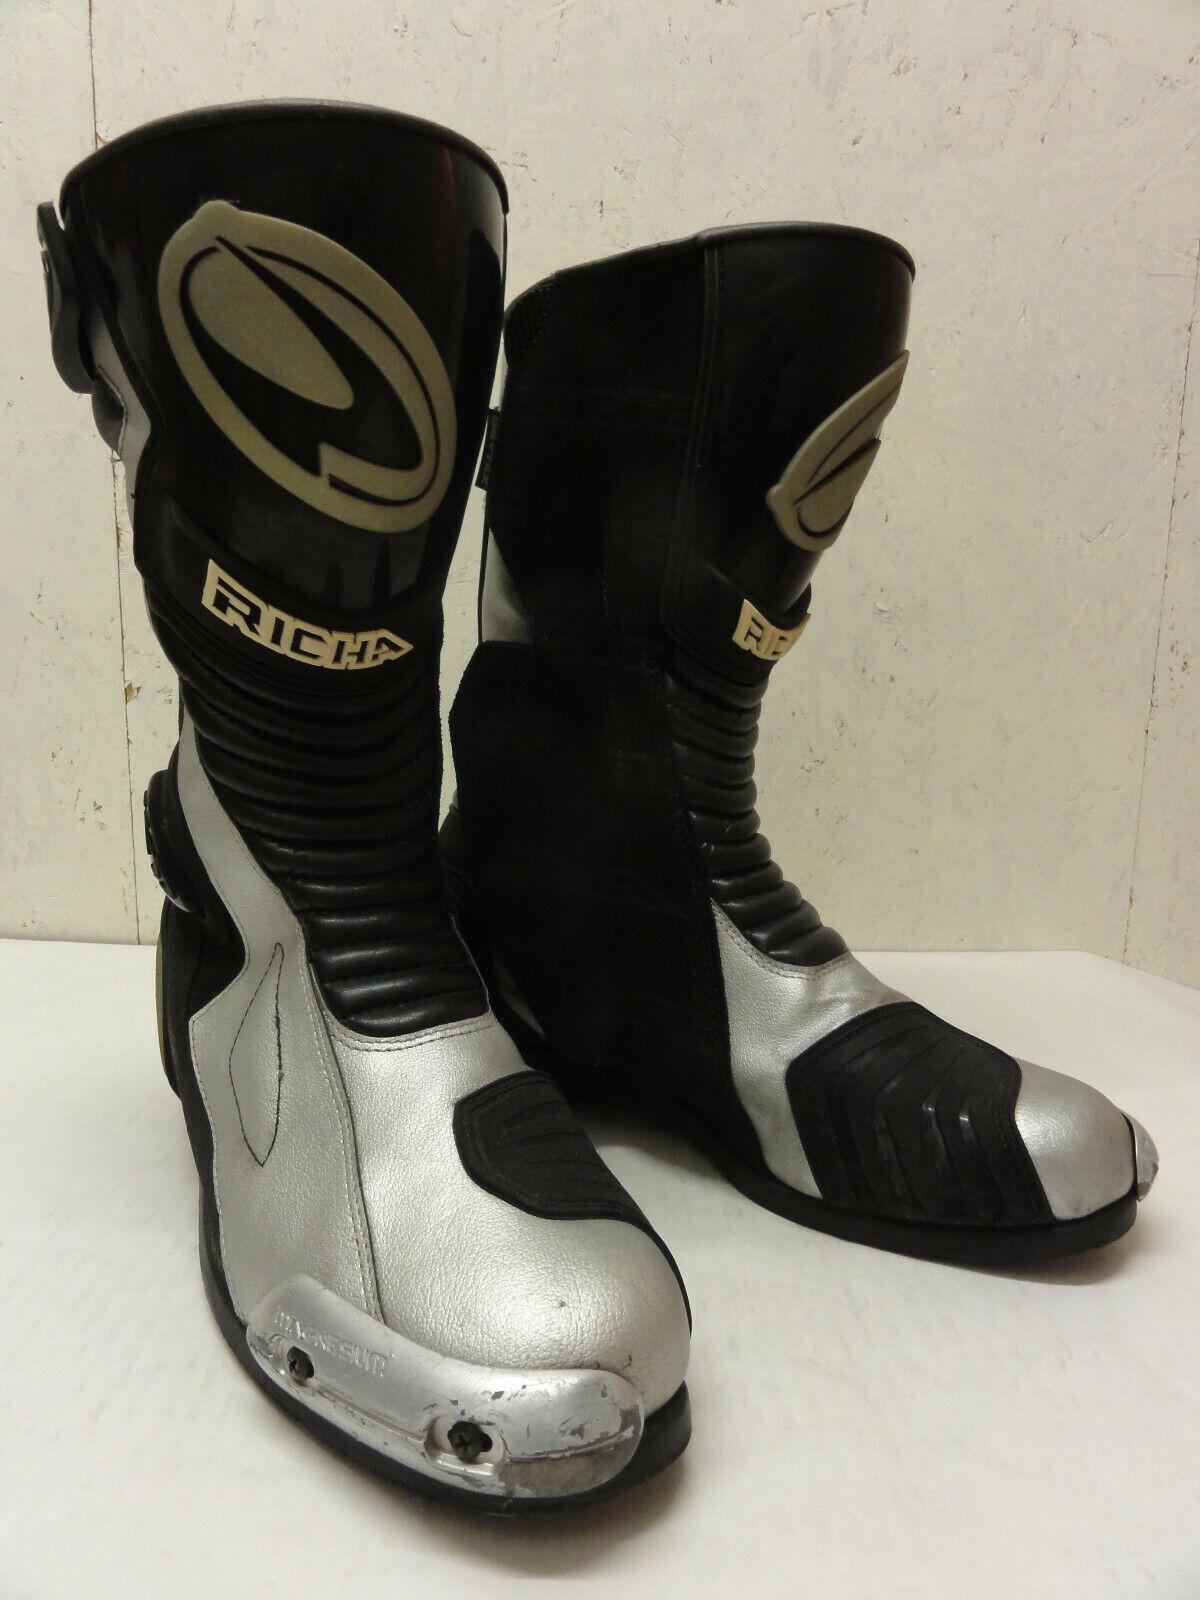 Motocross botten laarzen boots Richa nike gay biker alpinestars